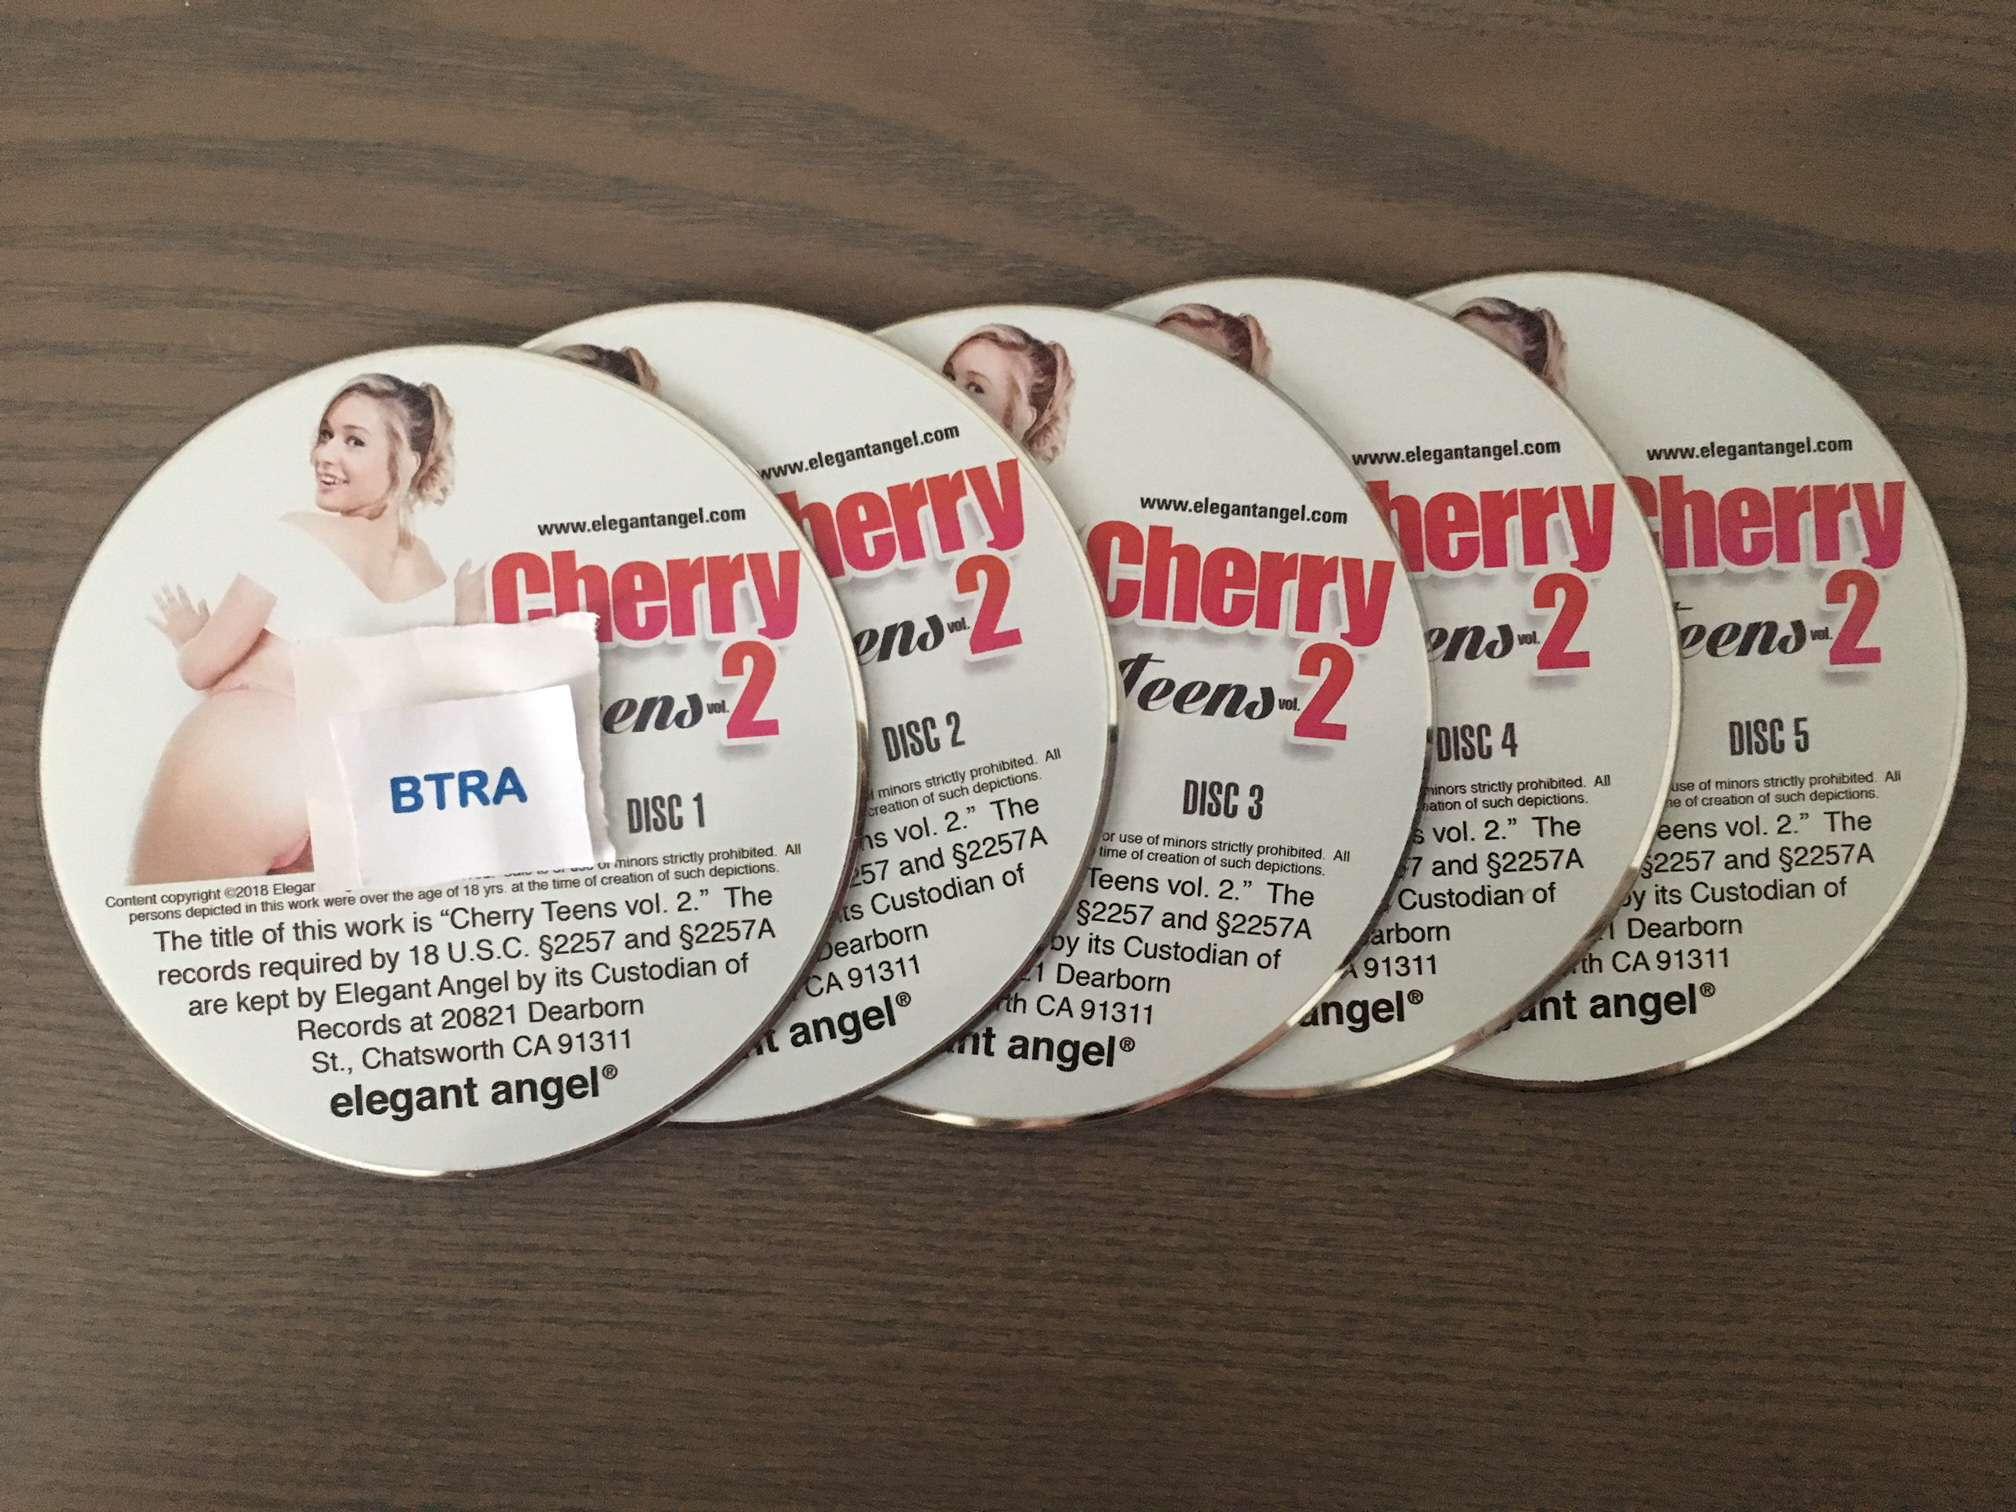 Cherry Teens 2 DiSC4 XXX DVDRip x264-BTRA